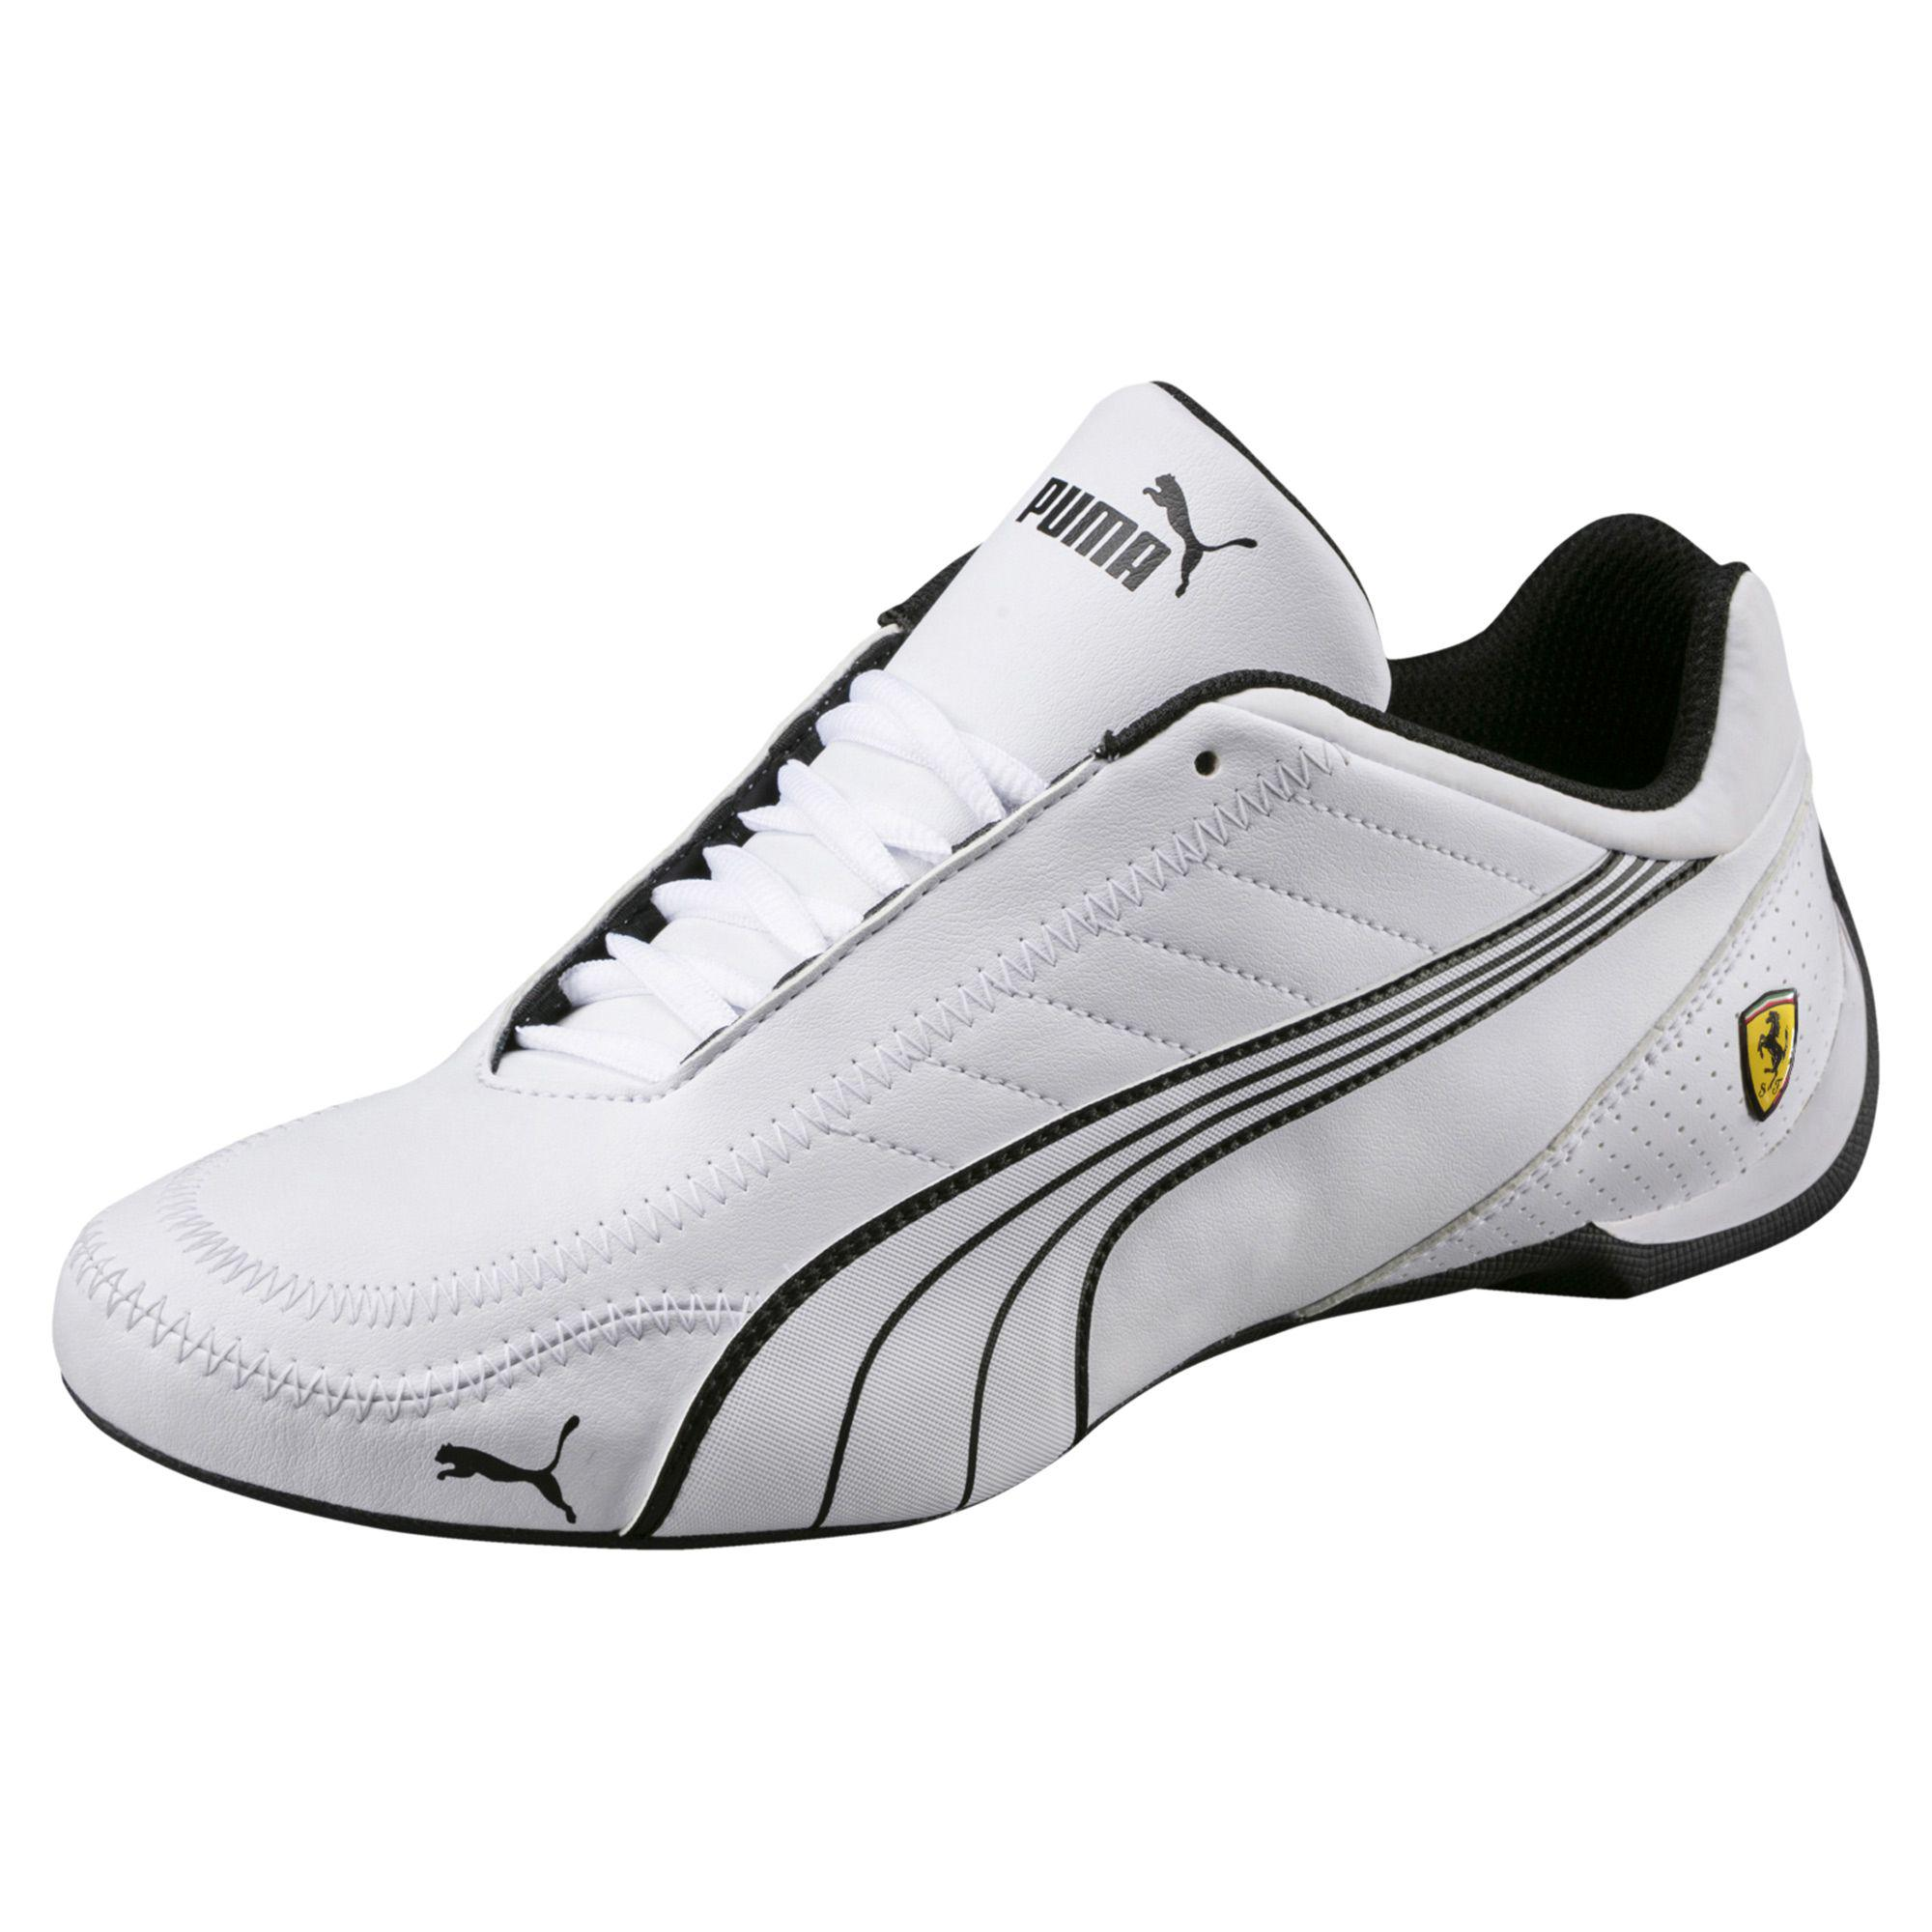 2b5787b4bd8c1c Lyst - PUMA Ferrari Future Cart Cat Men s Motorsport Shoes in White ...